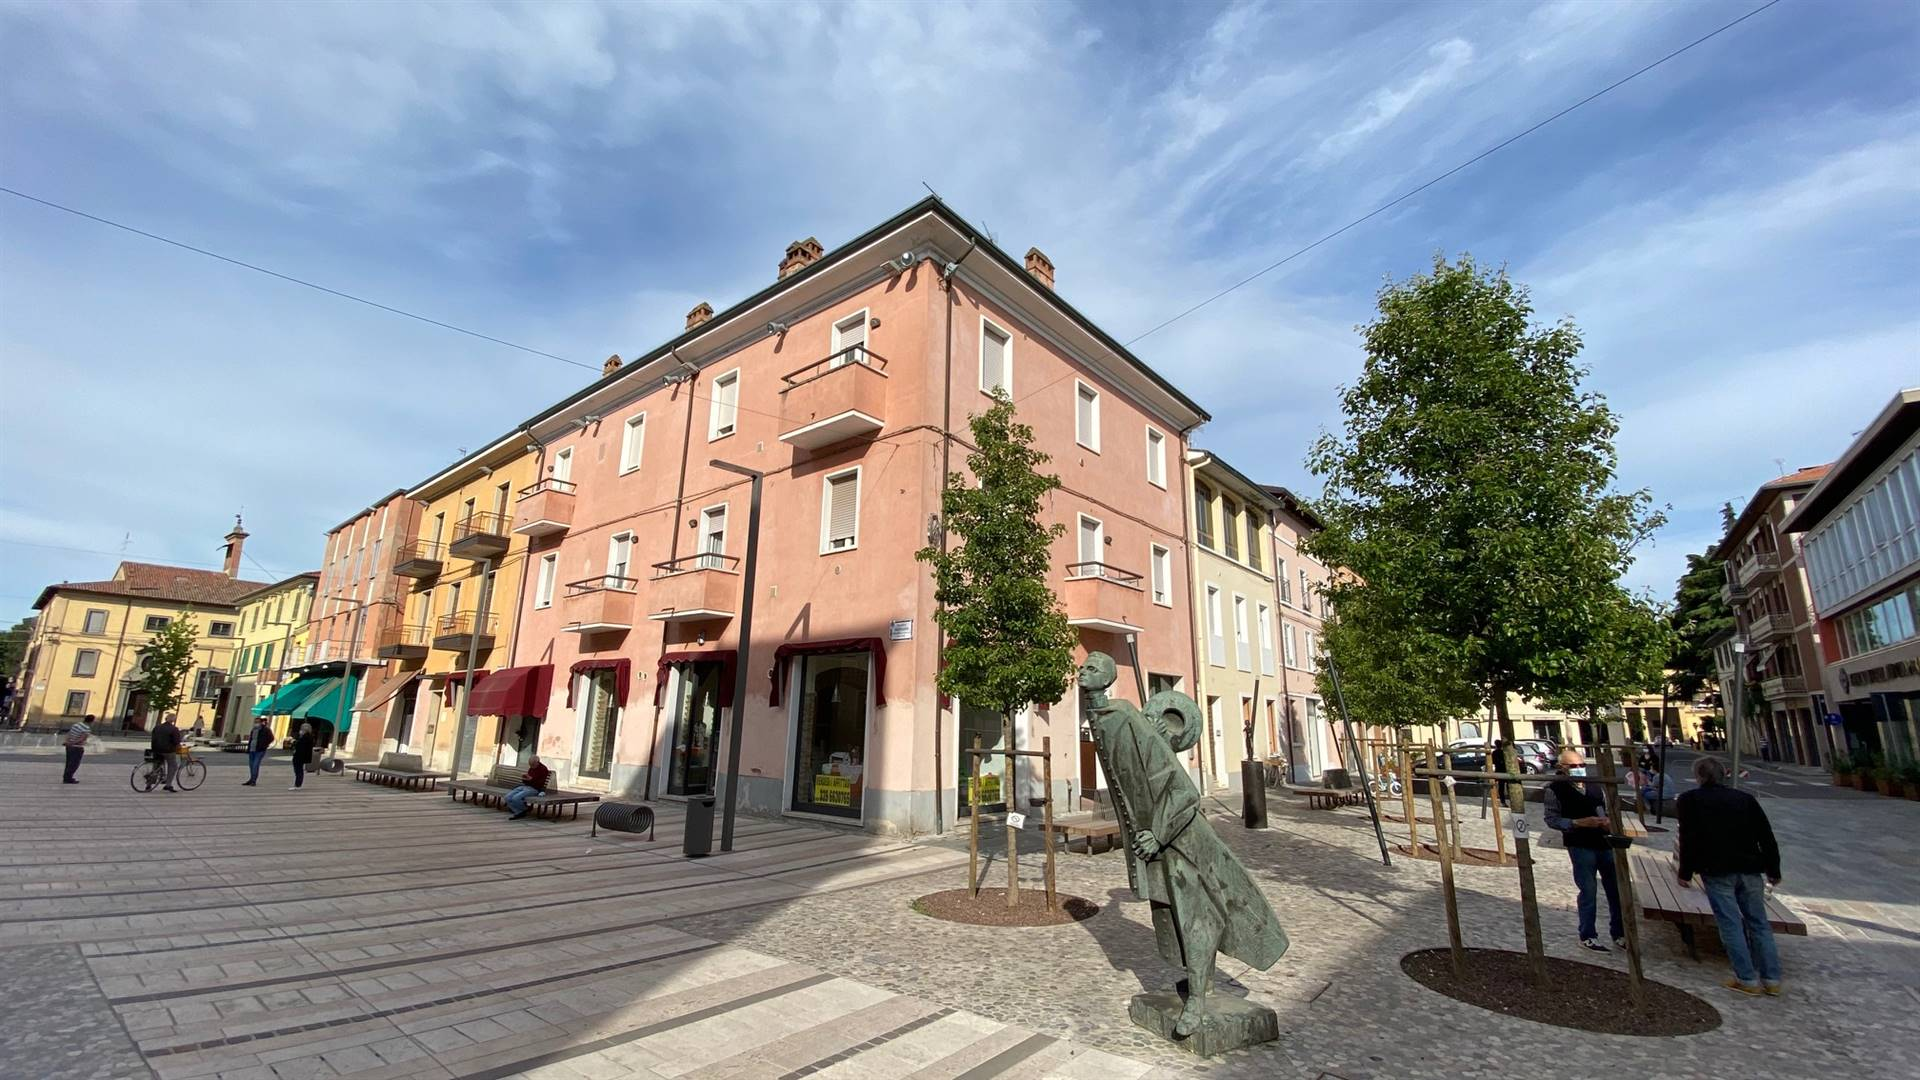 Piazza Fanti